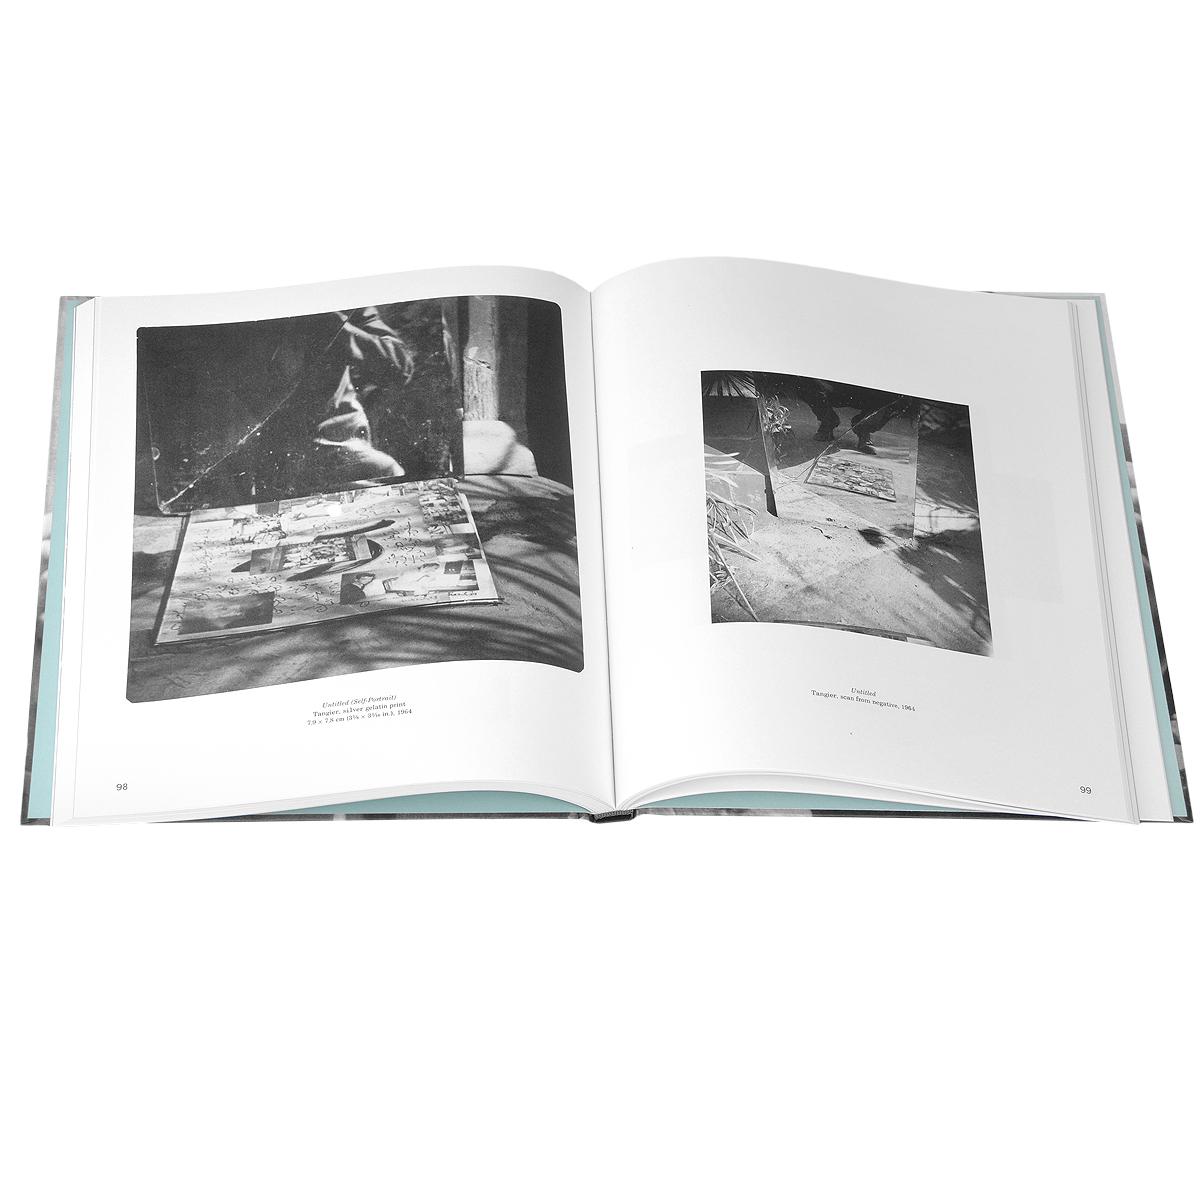 60 ingenious photos of Soviet Union by the USSR photographers Take a shot photography navarre ohio